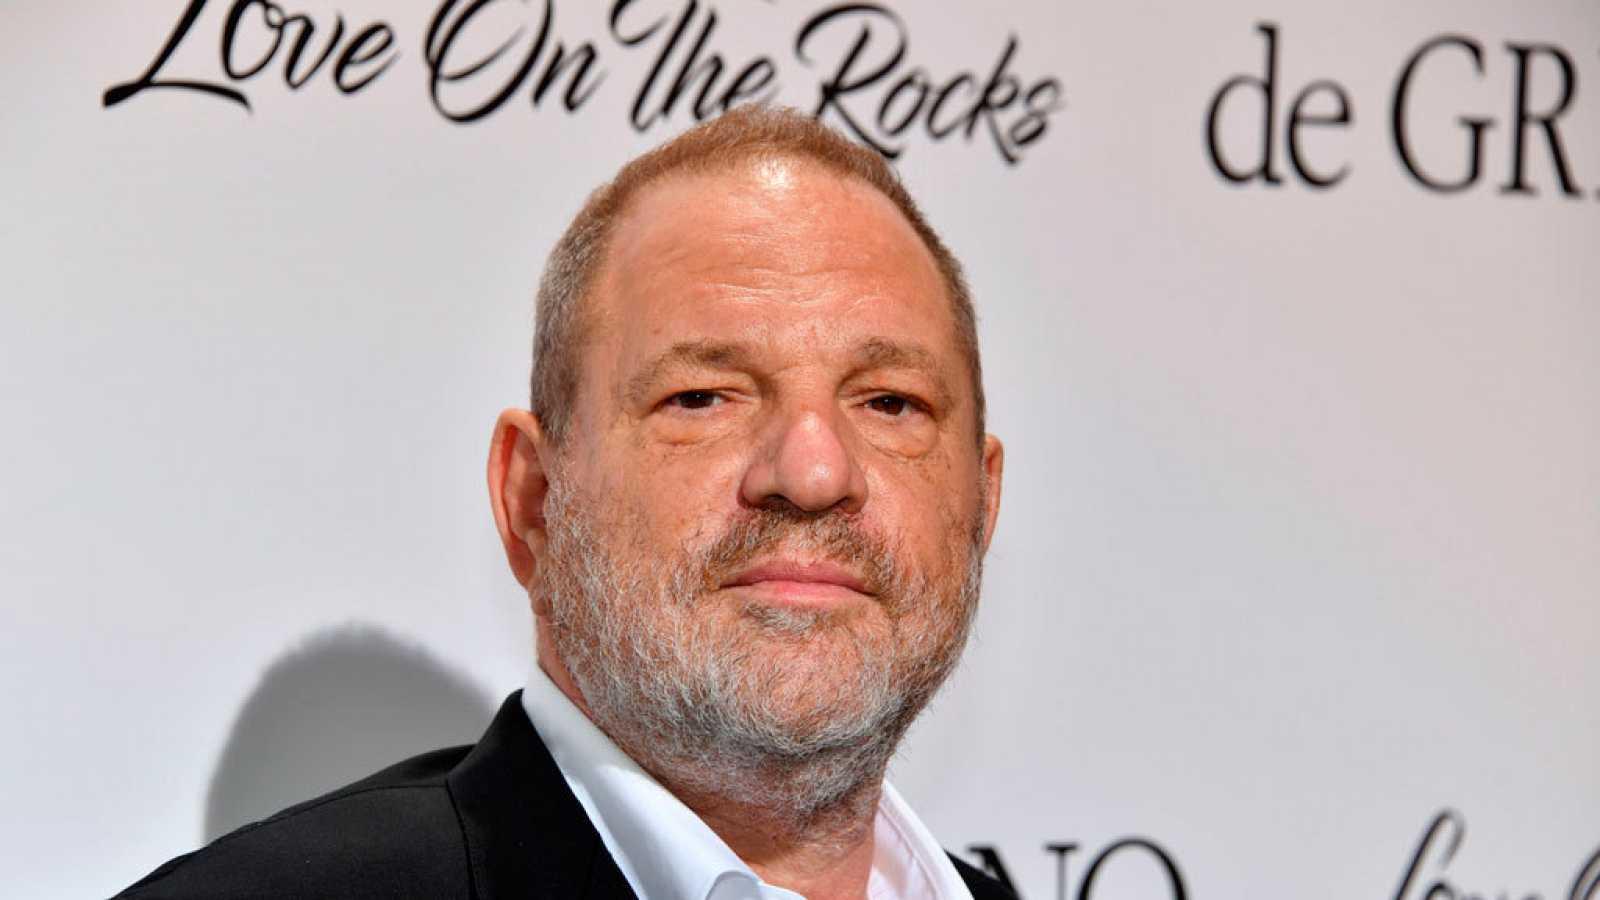 La Academia de Hollywood expulsa a Harvey Weinstein